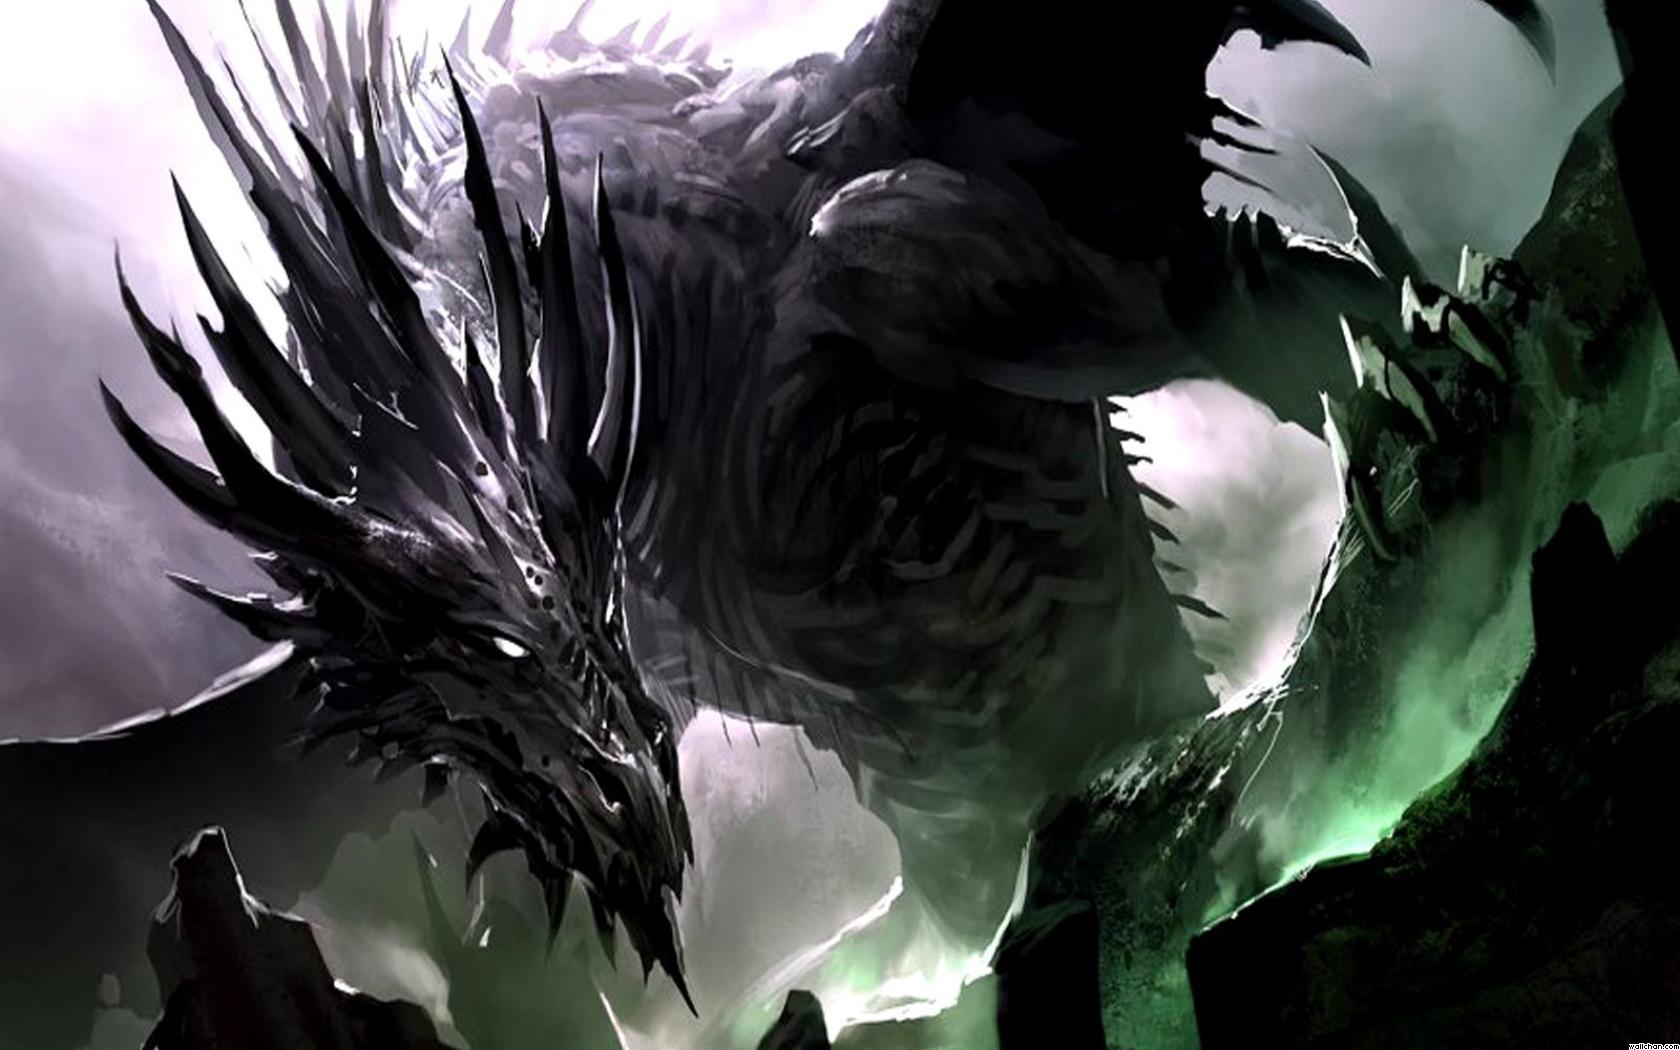 Ice Dragon Wallpaper Hd 38435 black ice dragon melden 1680x1050